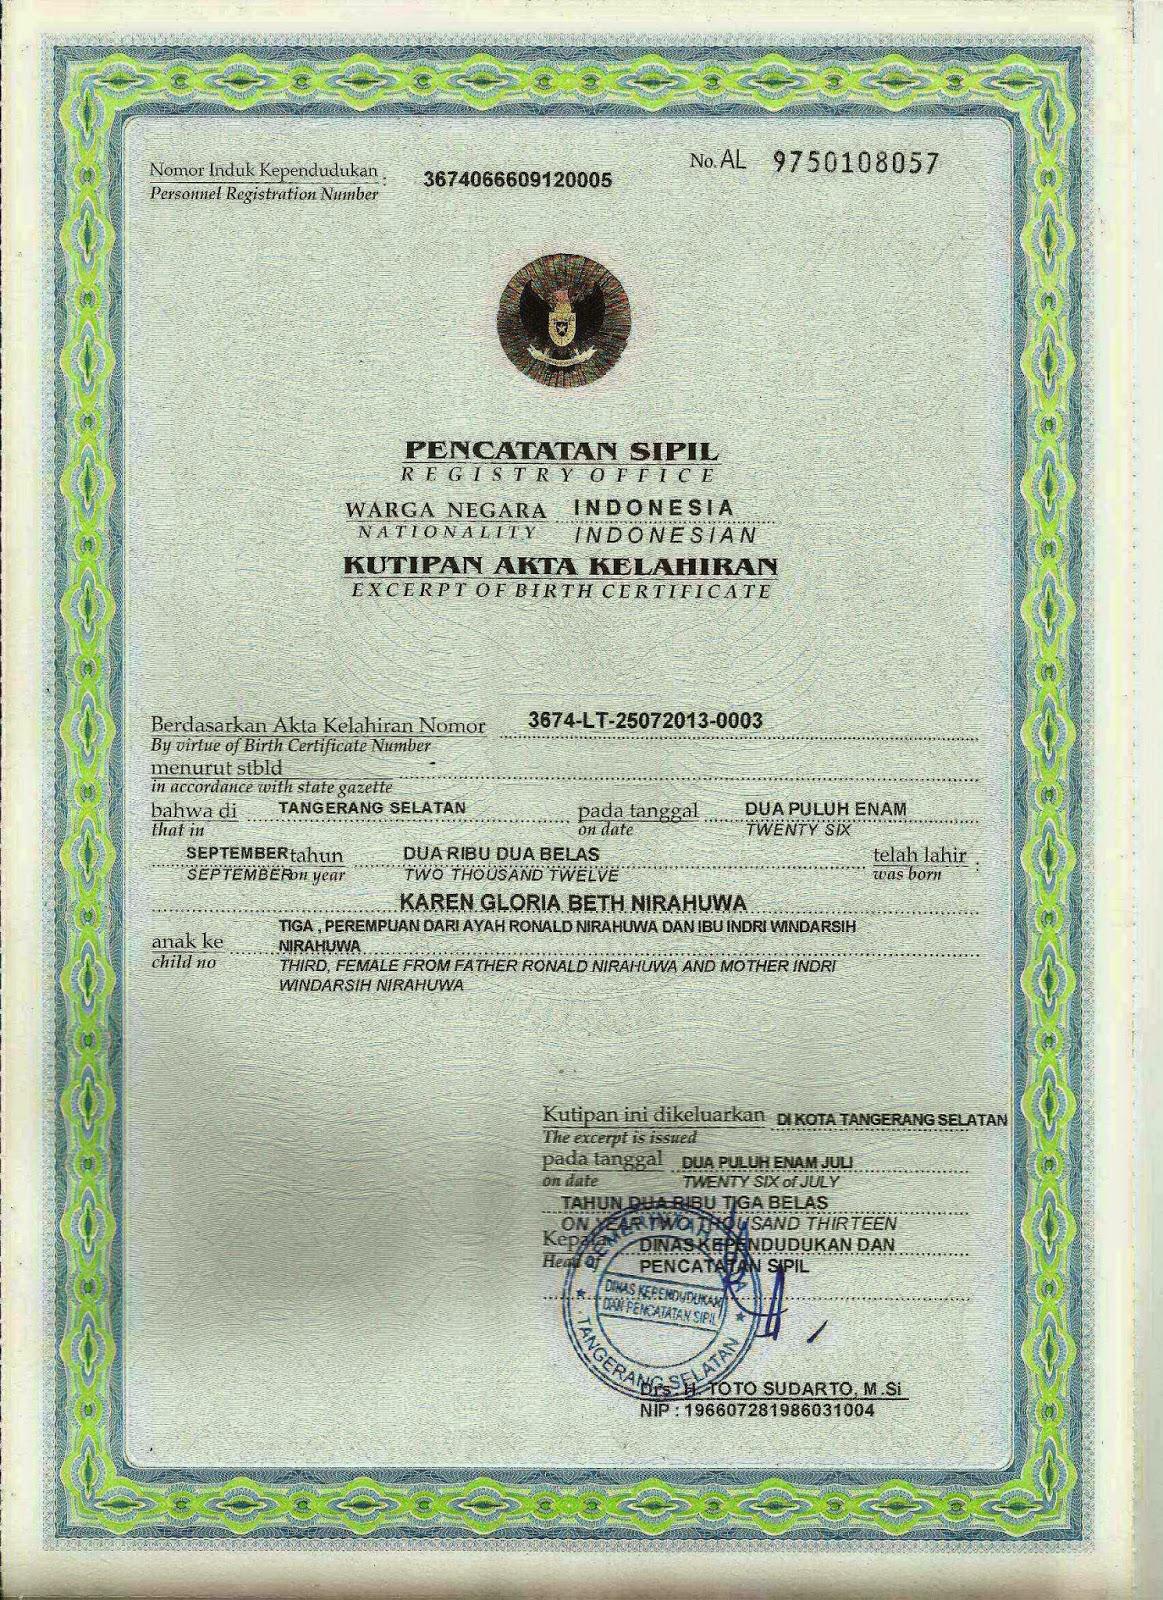 Akte Kelahiran salah satu syarat kelengkapan dokumen permohonan PASPOR #jasaPaspor